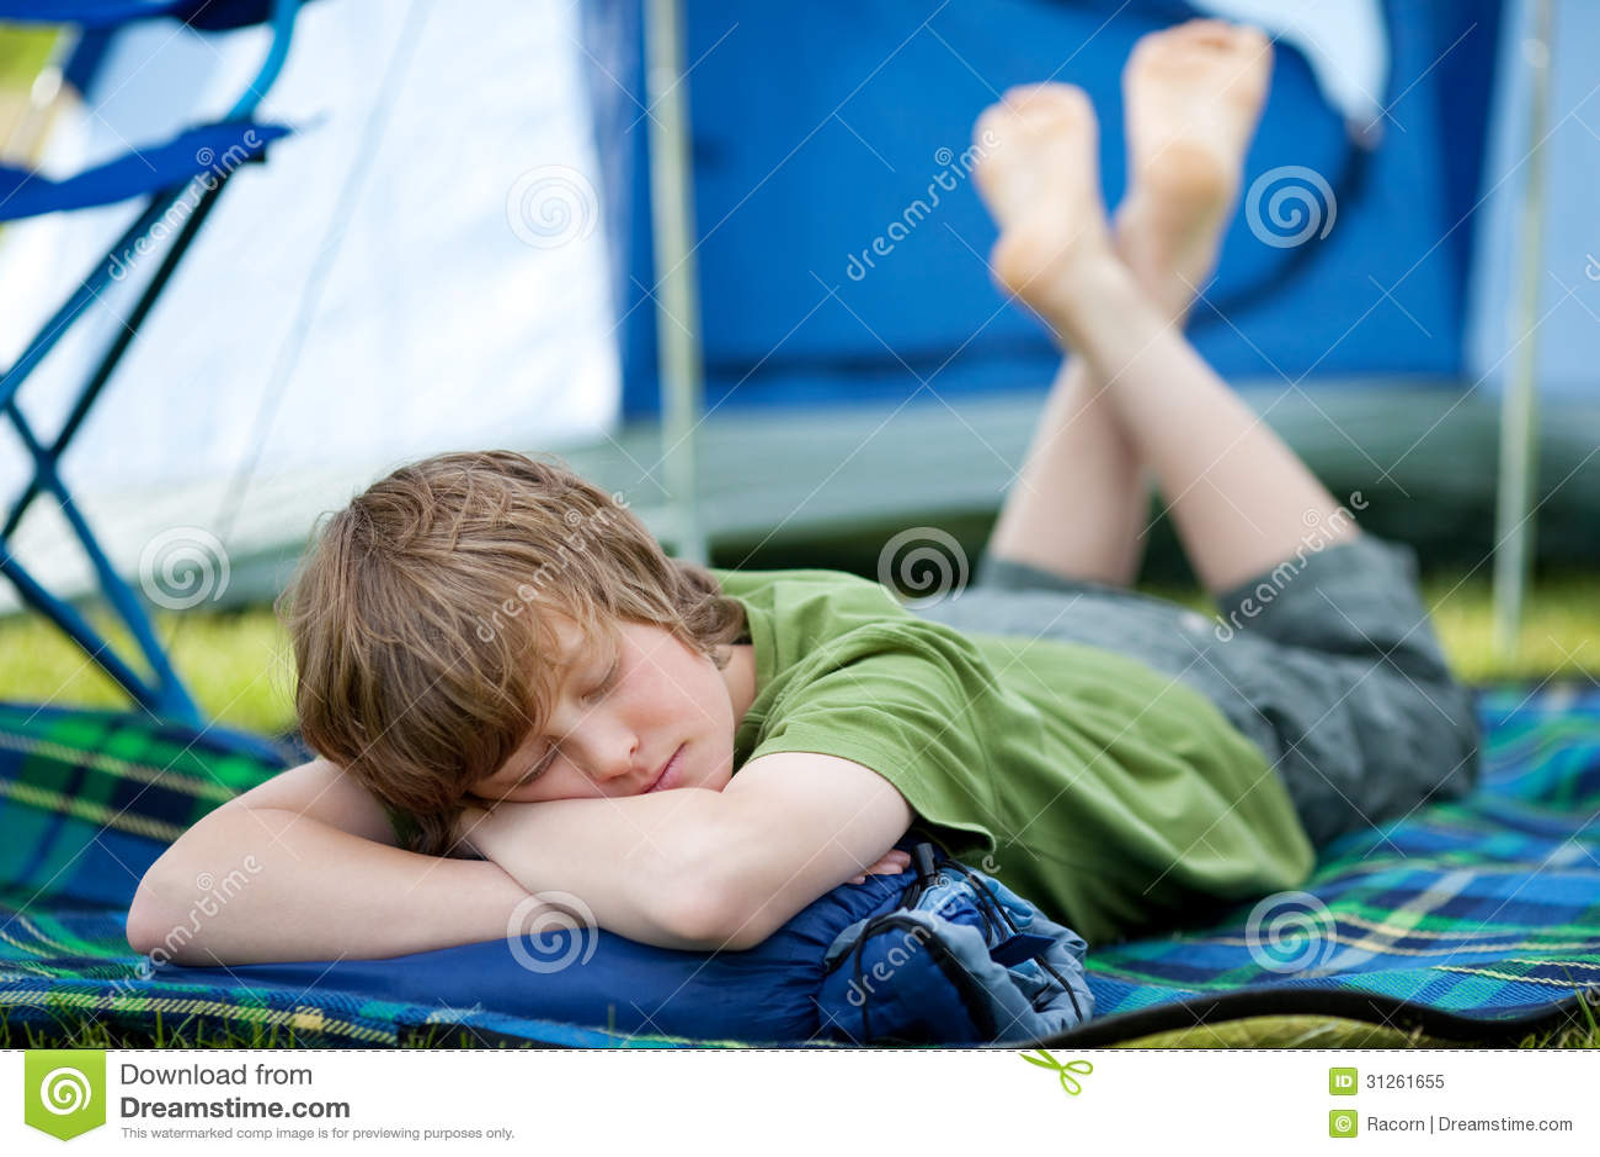 Teen Center May St Sleep 55